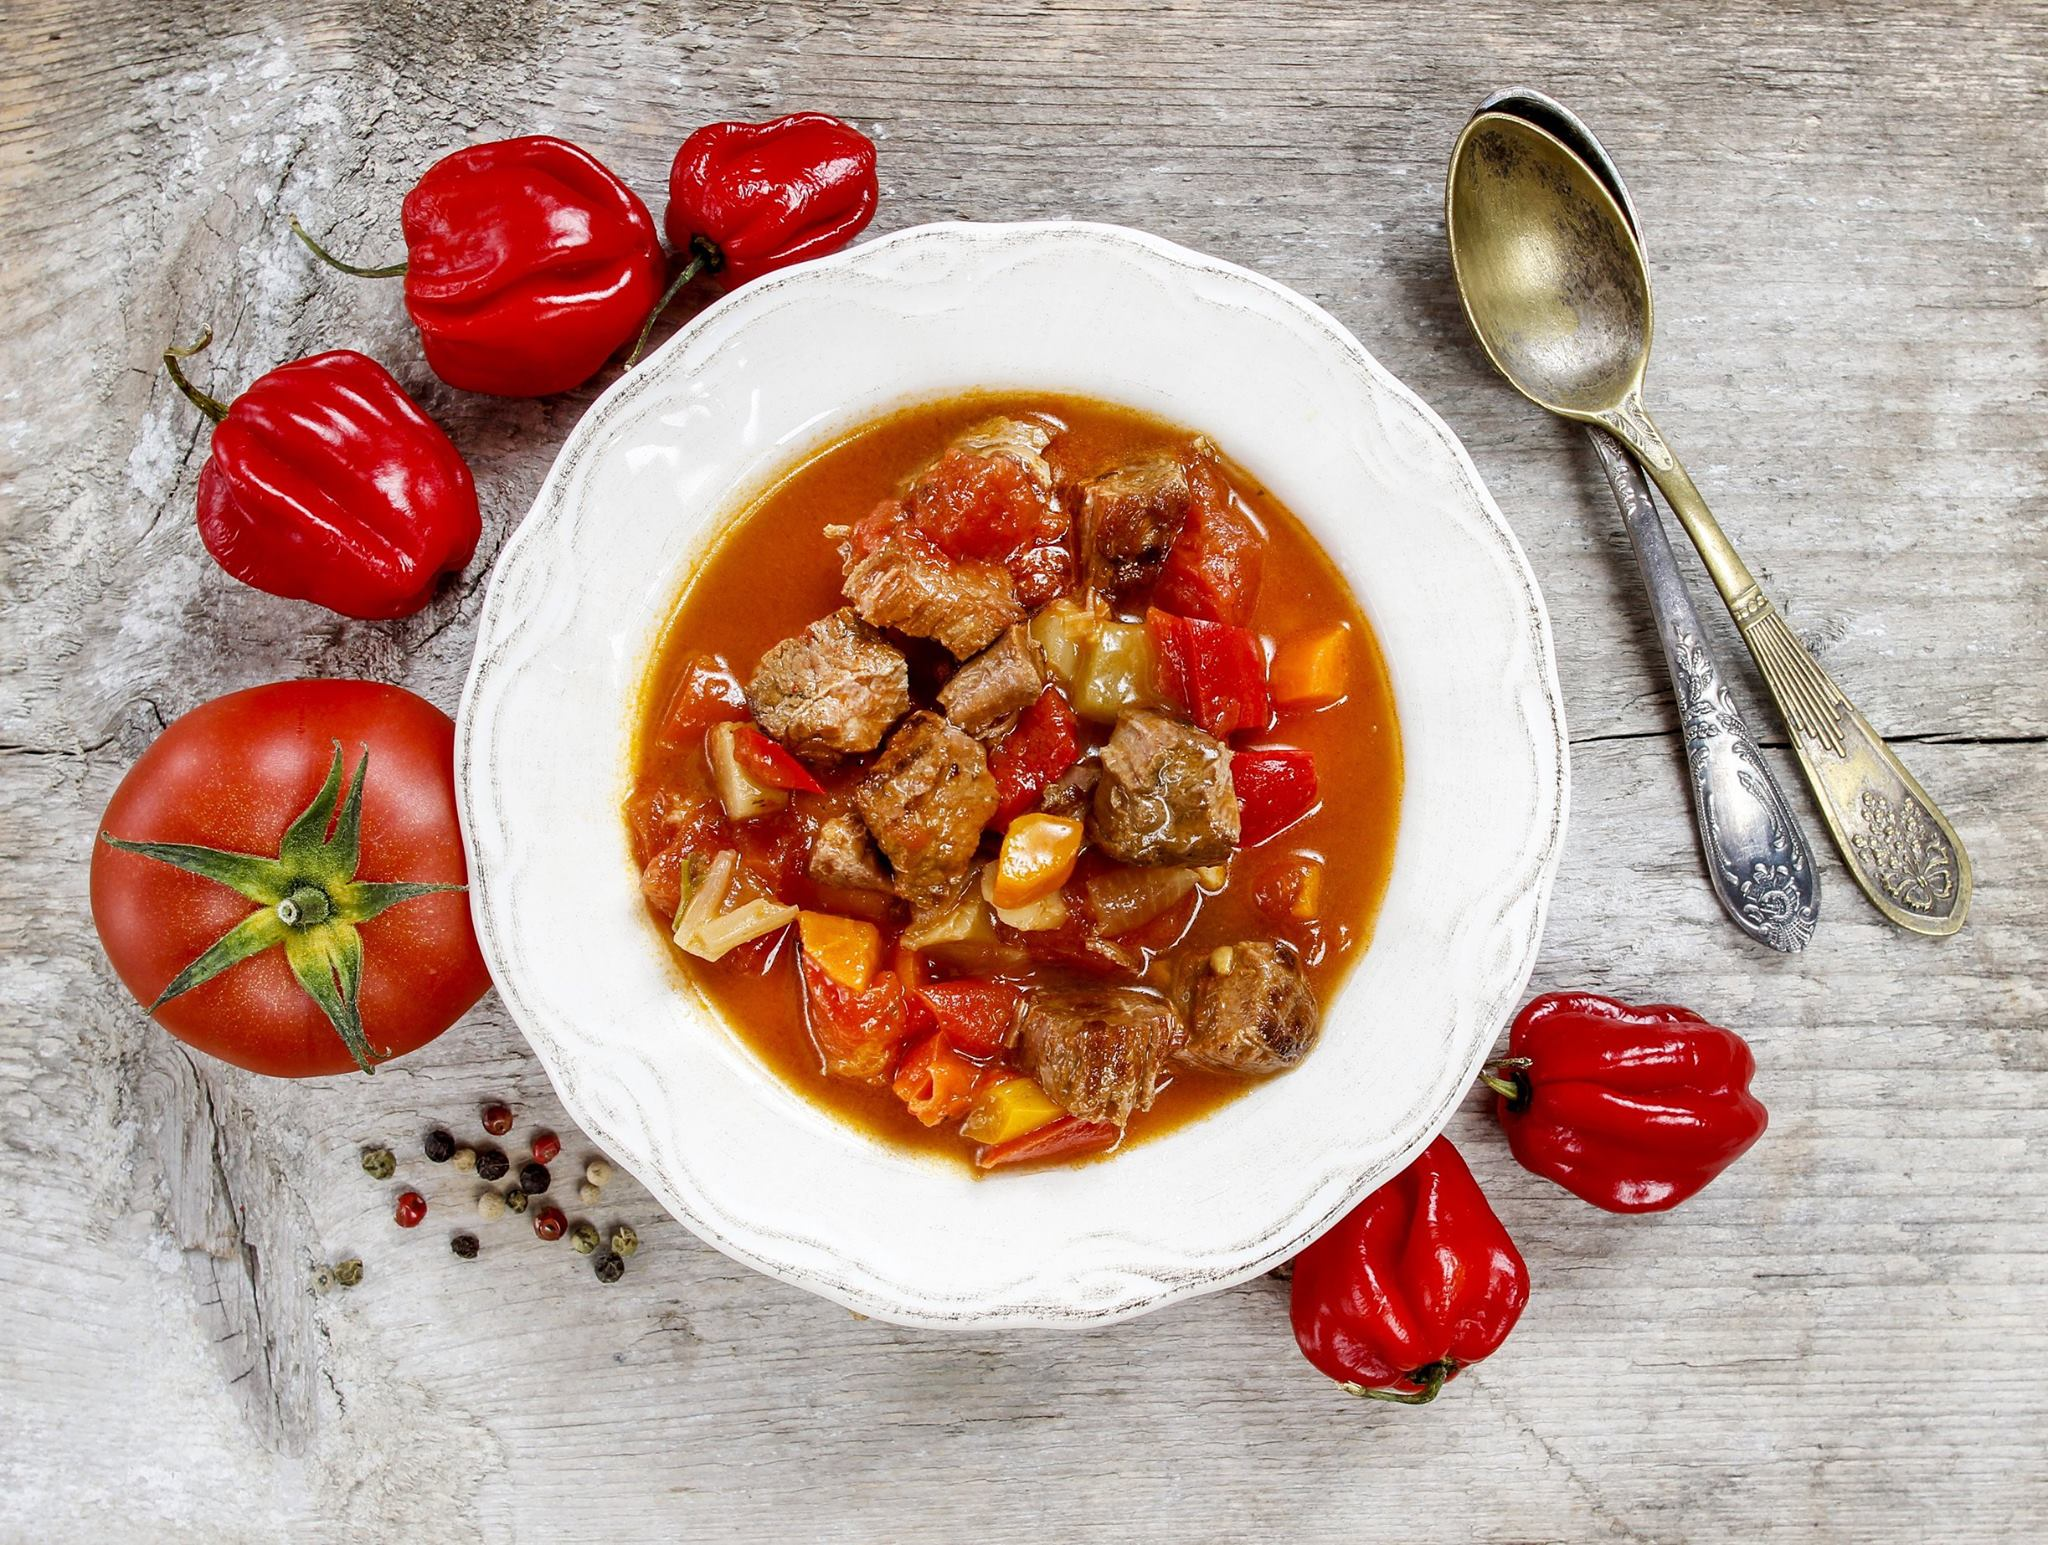 Çorbe me mish